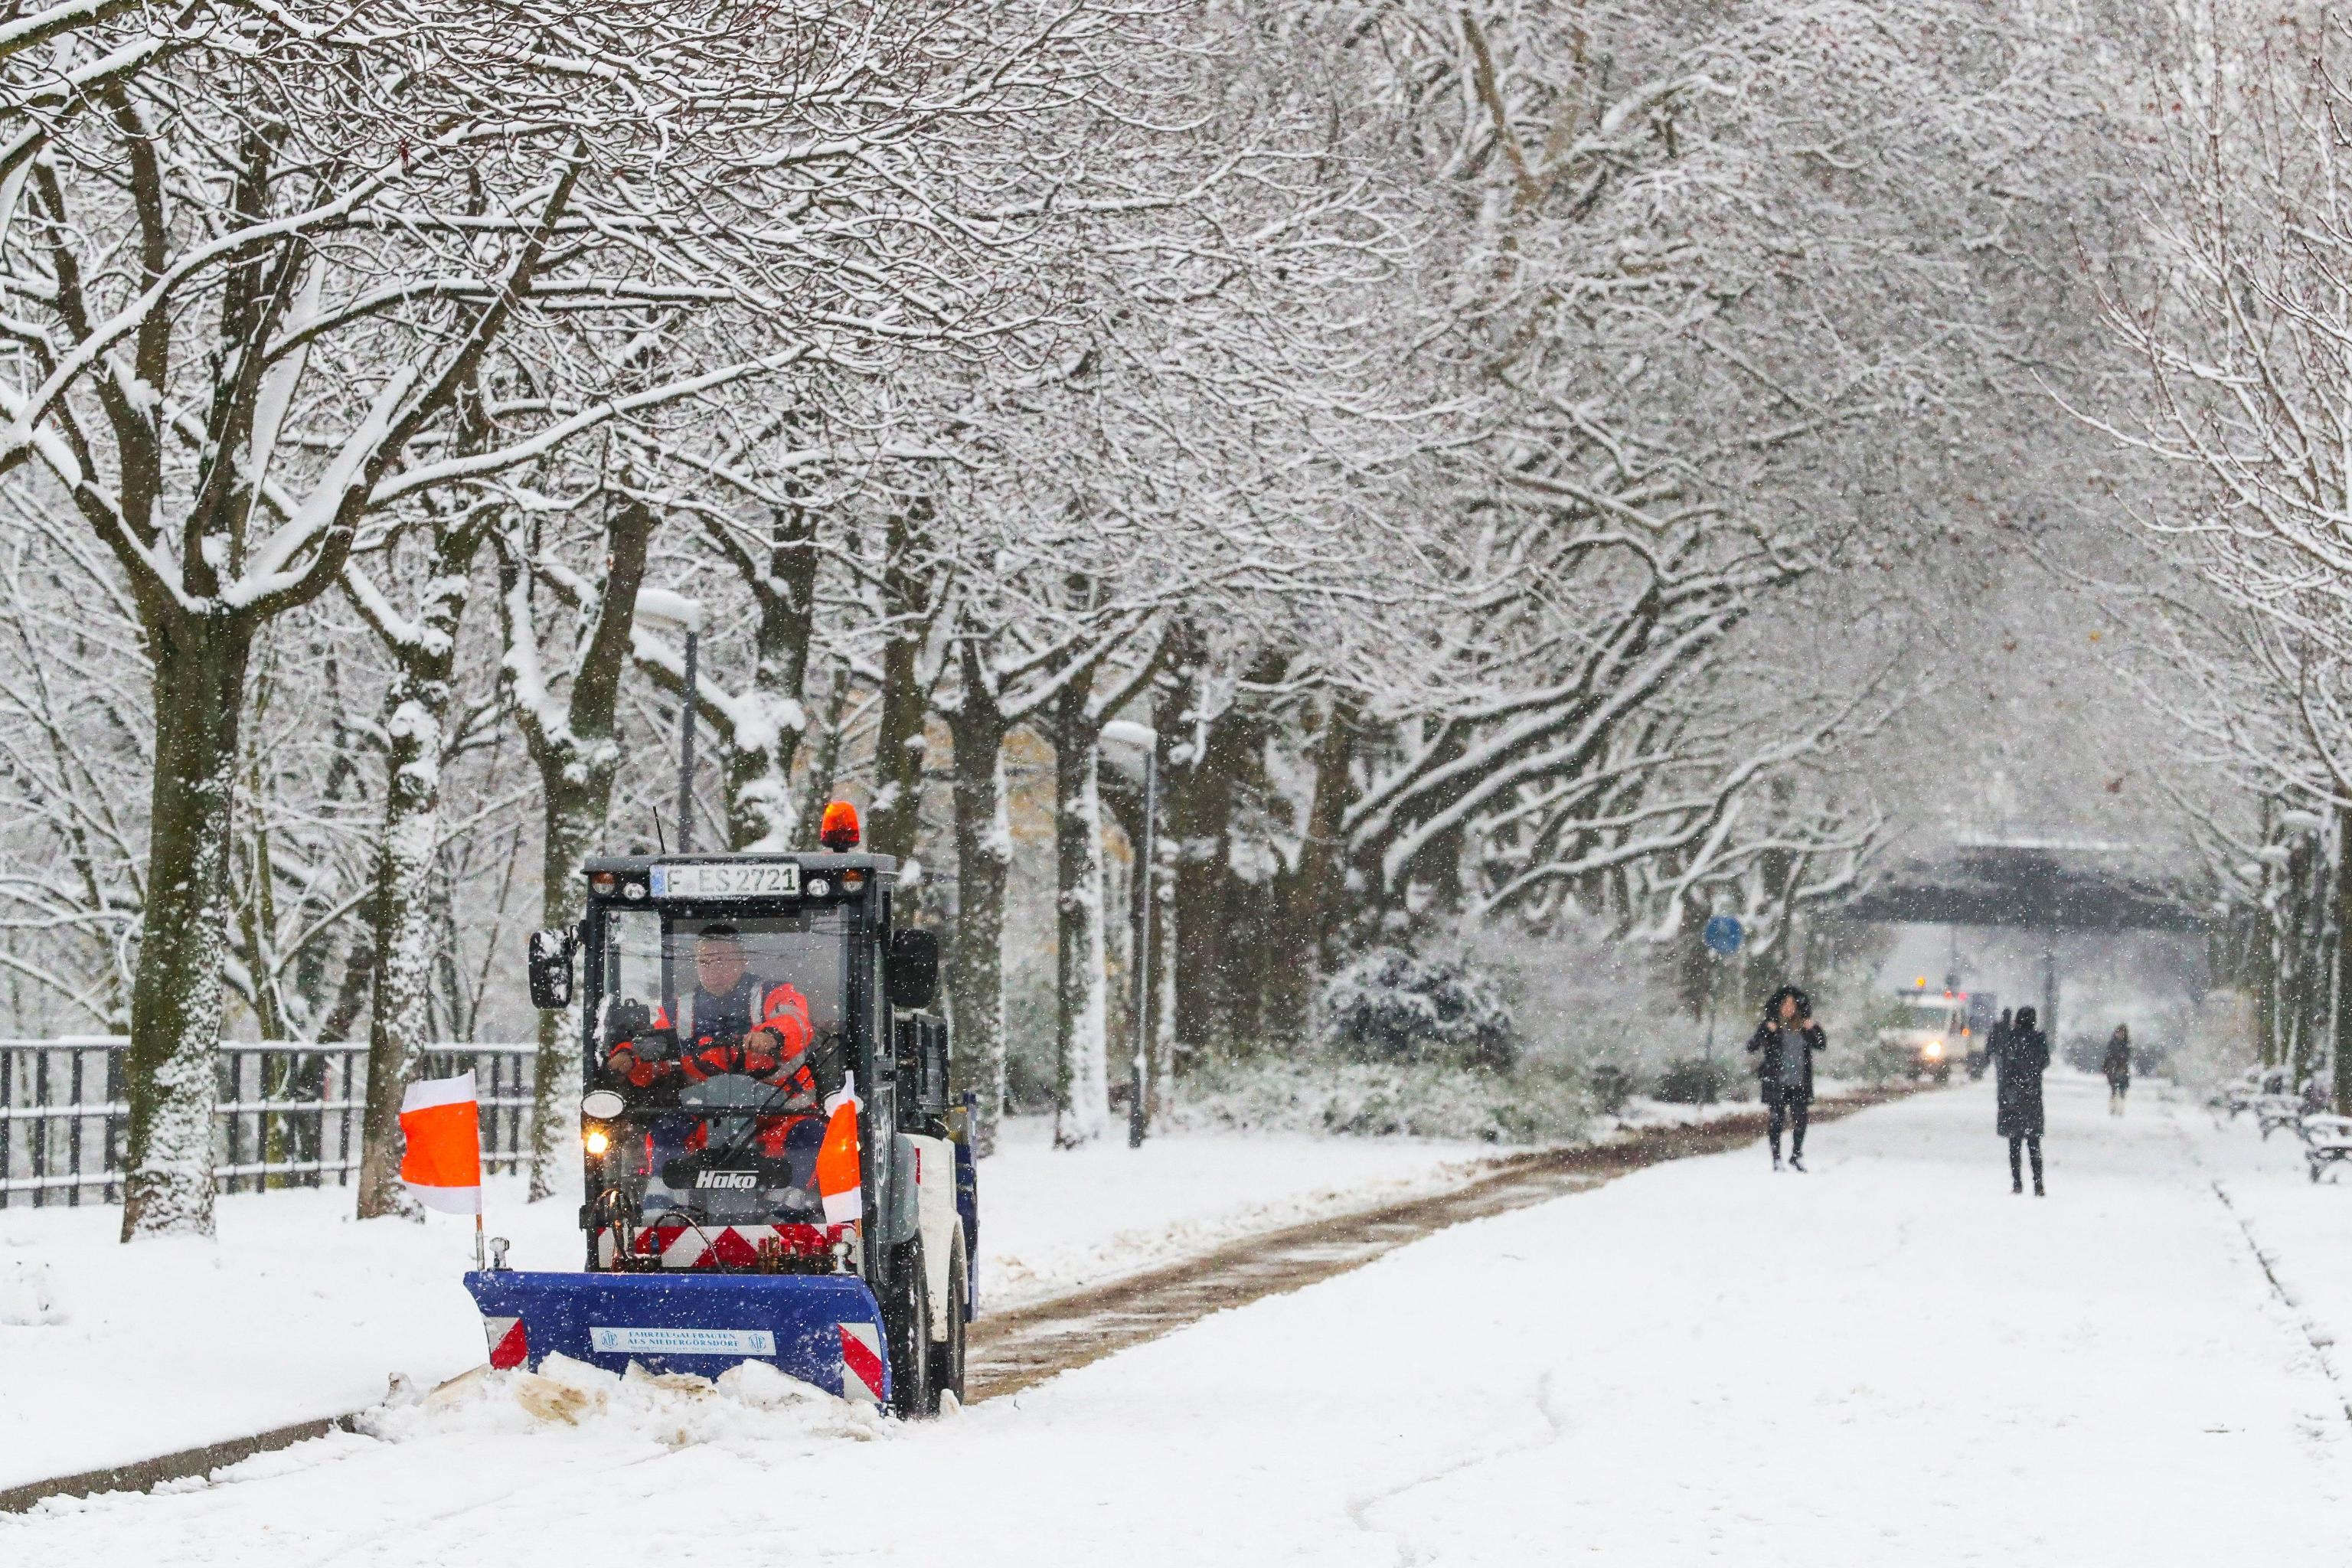 Germania: neve blocca aerei e strade